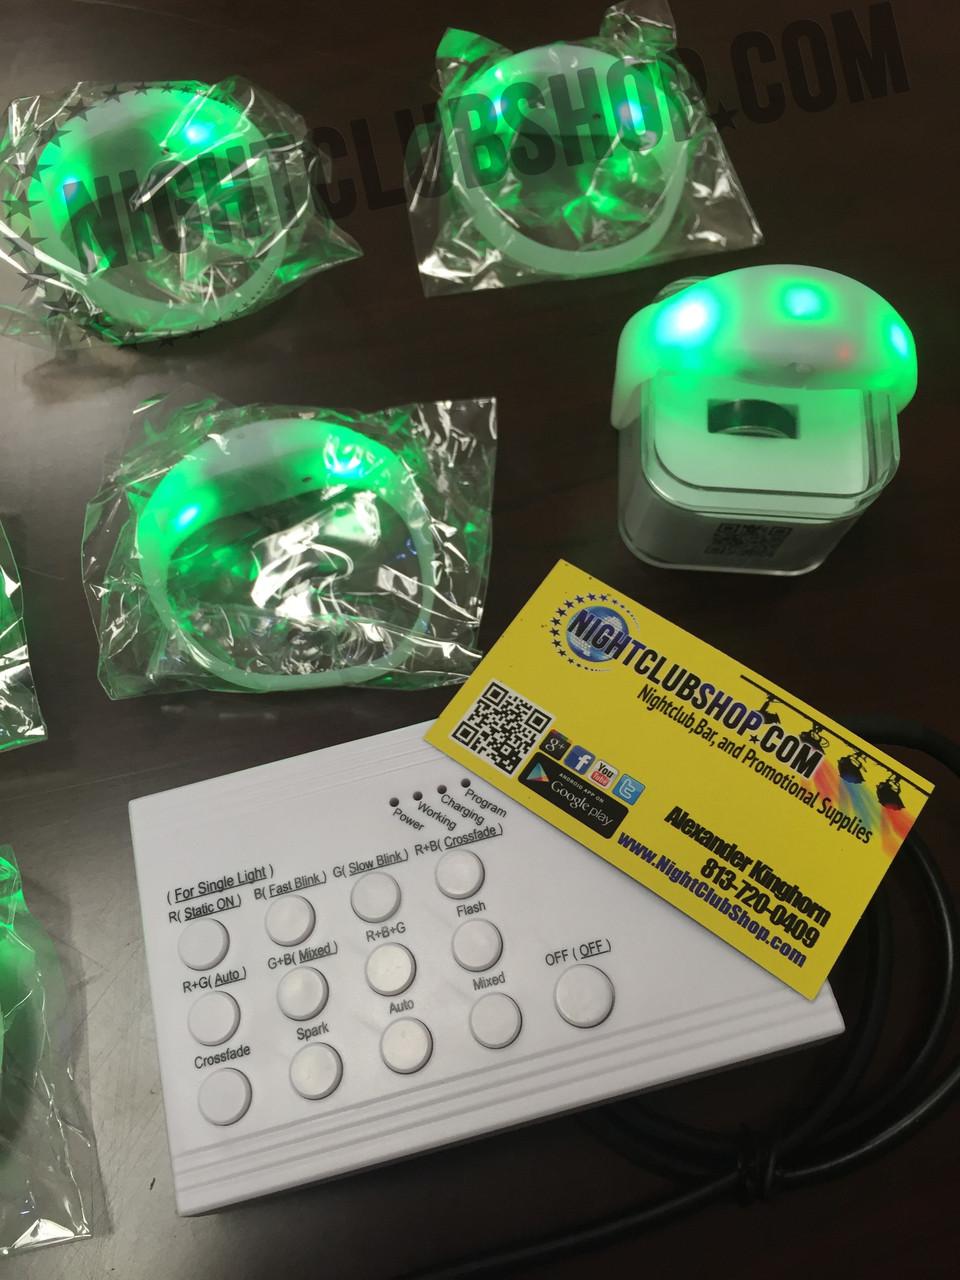 RF, Radio,Frequency, Remote, Control, Base,Unit, Controller, RF, RFID, RF LED wristband, RF LED Foam Stick, Rf LED Glorifier, RF LED BeachBall, Control Remoto